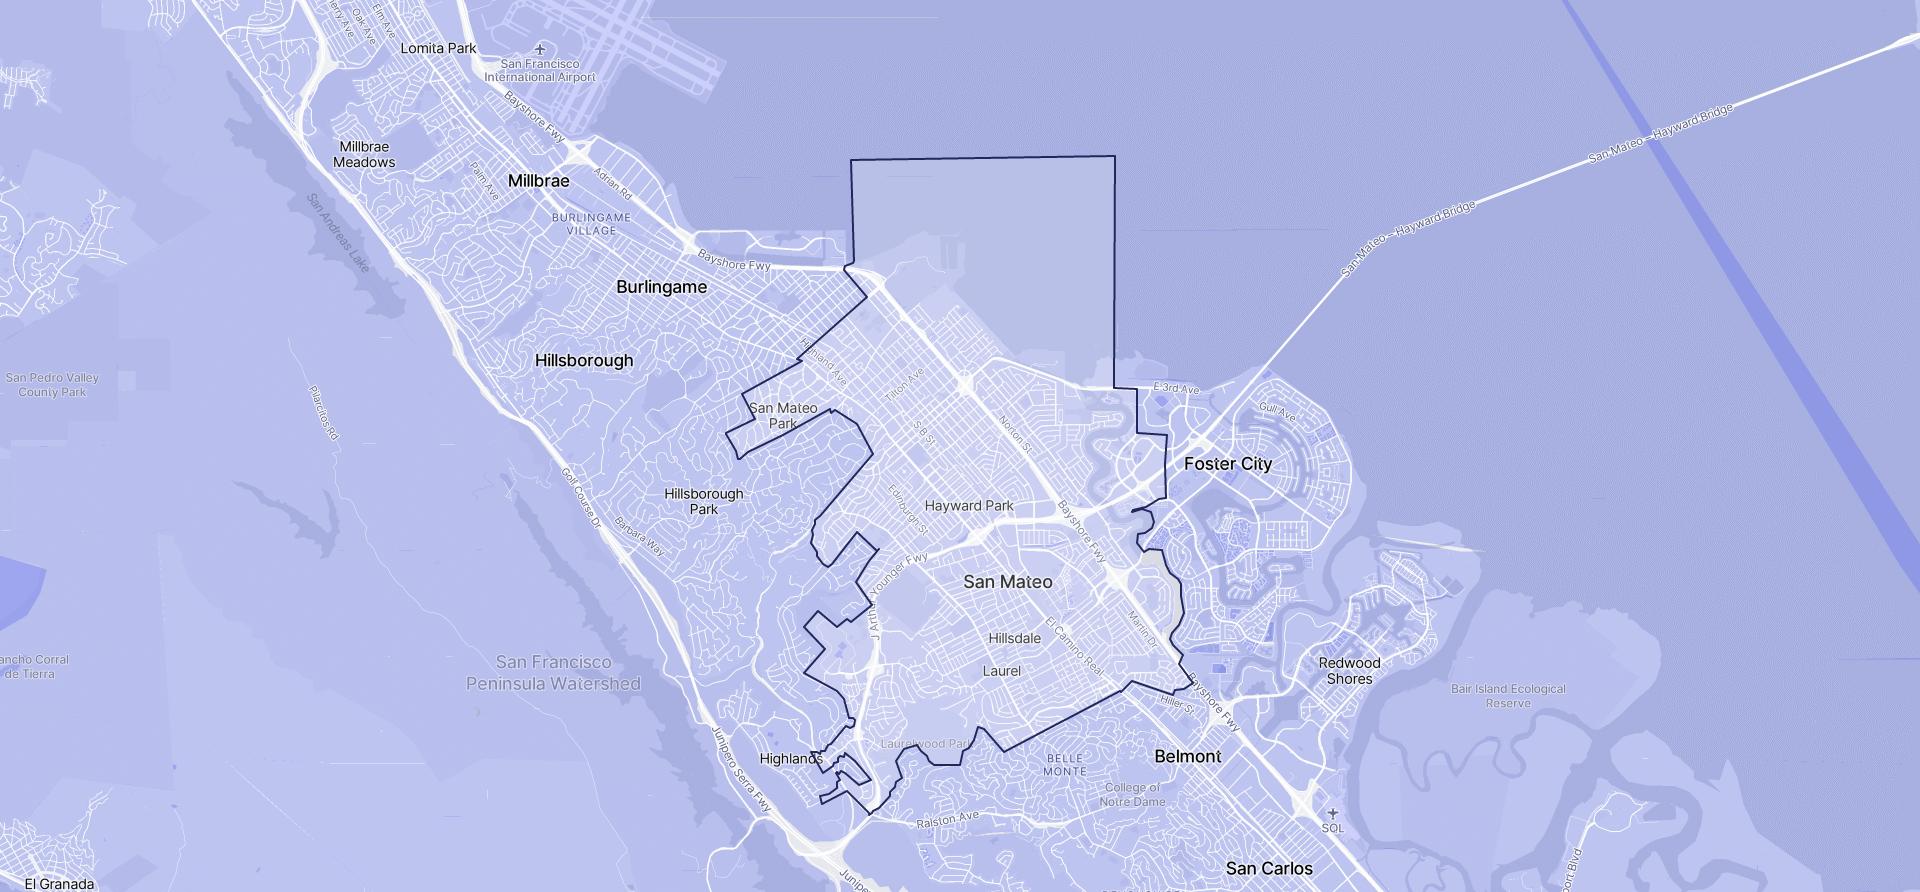 Image of San Mateo boundaries on a map.